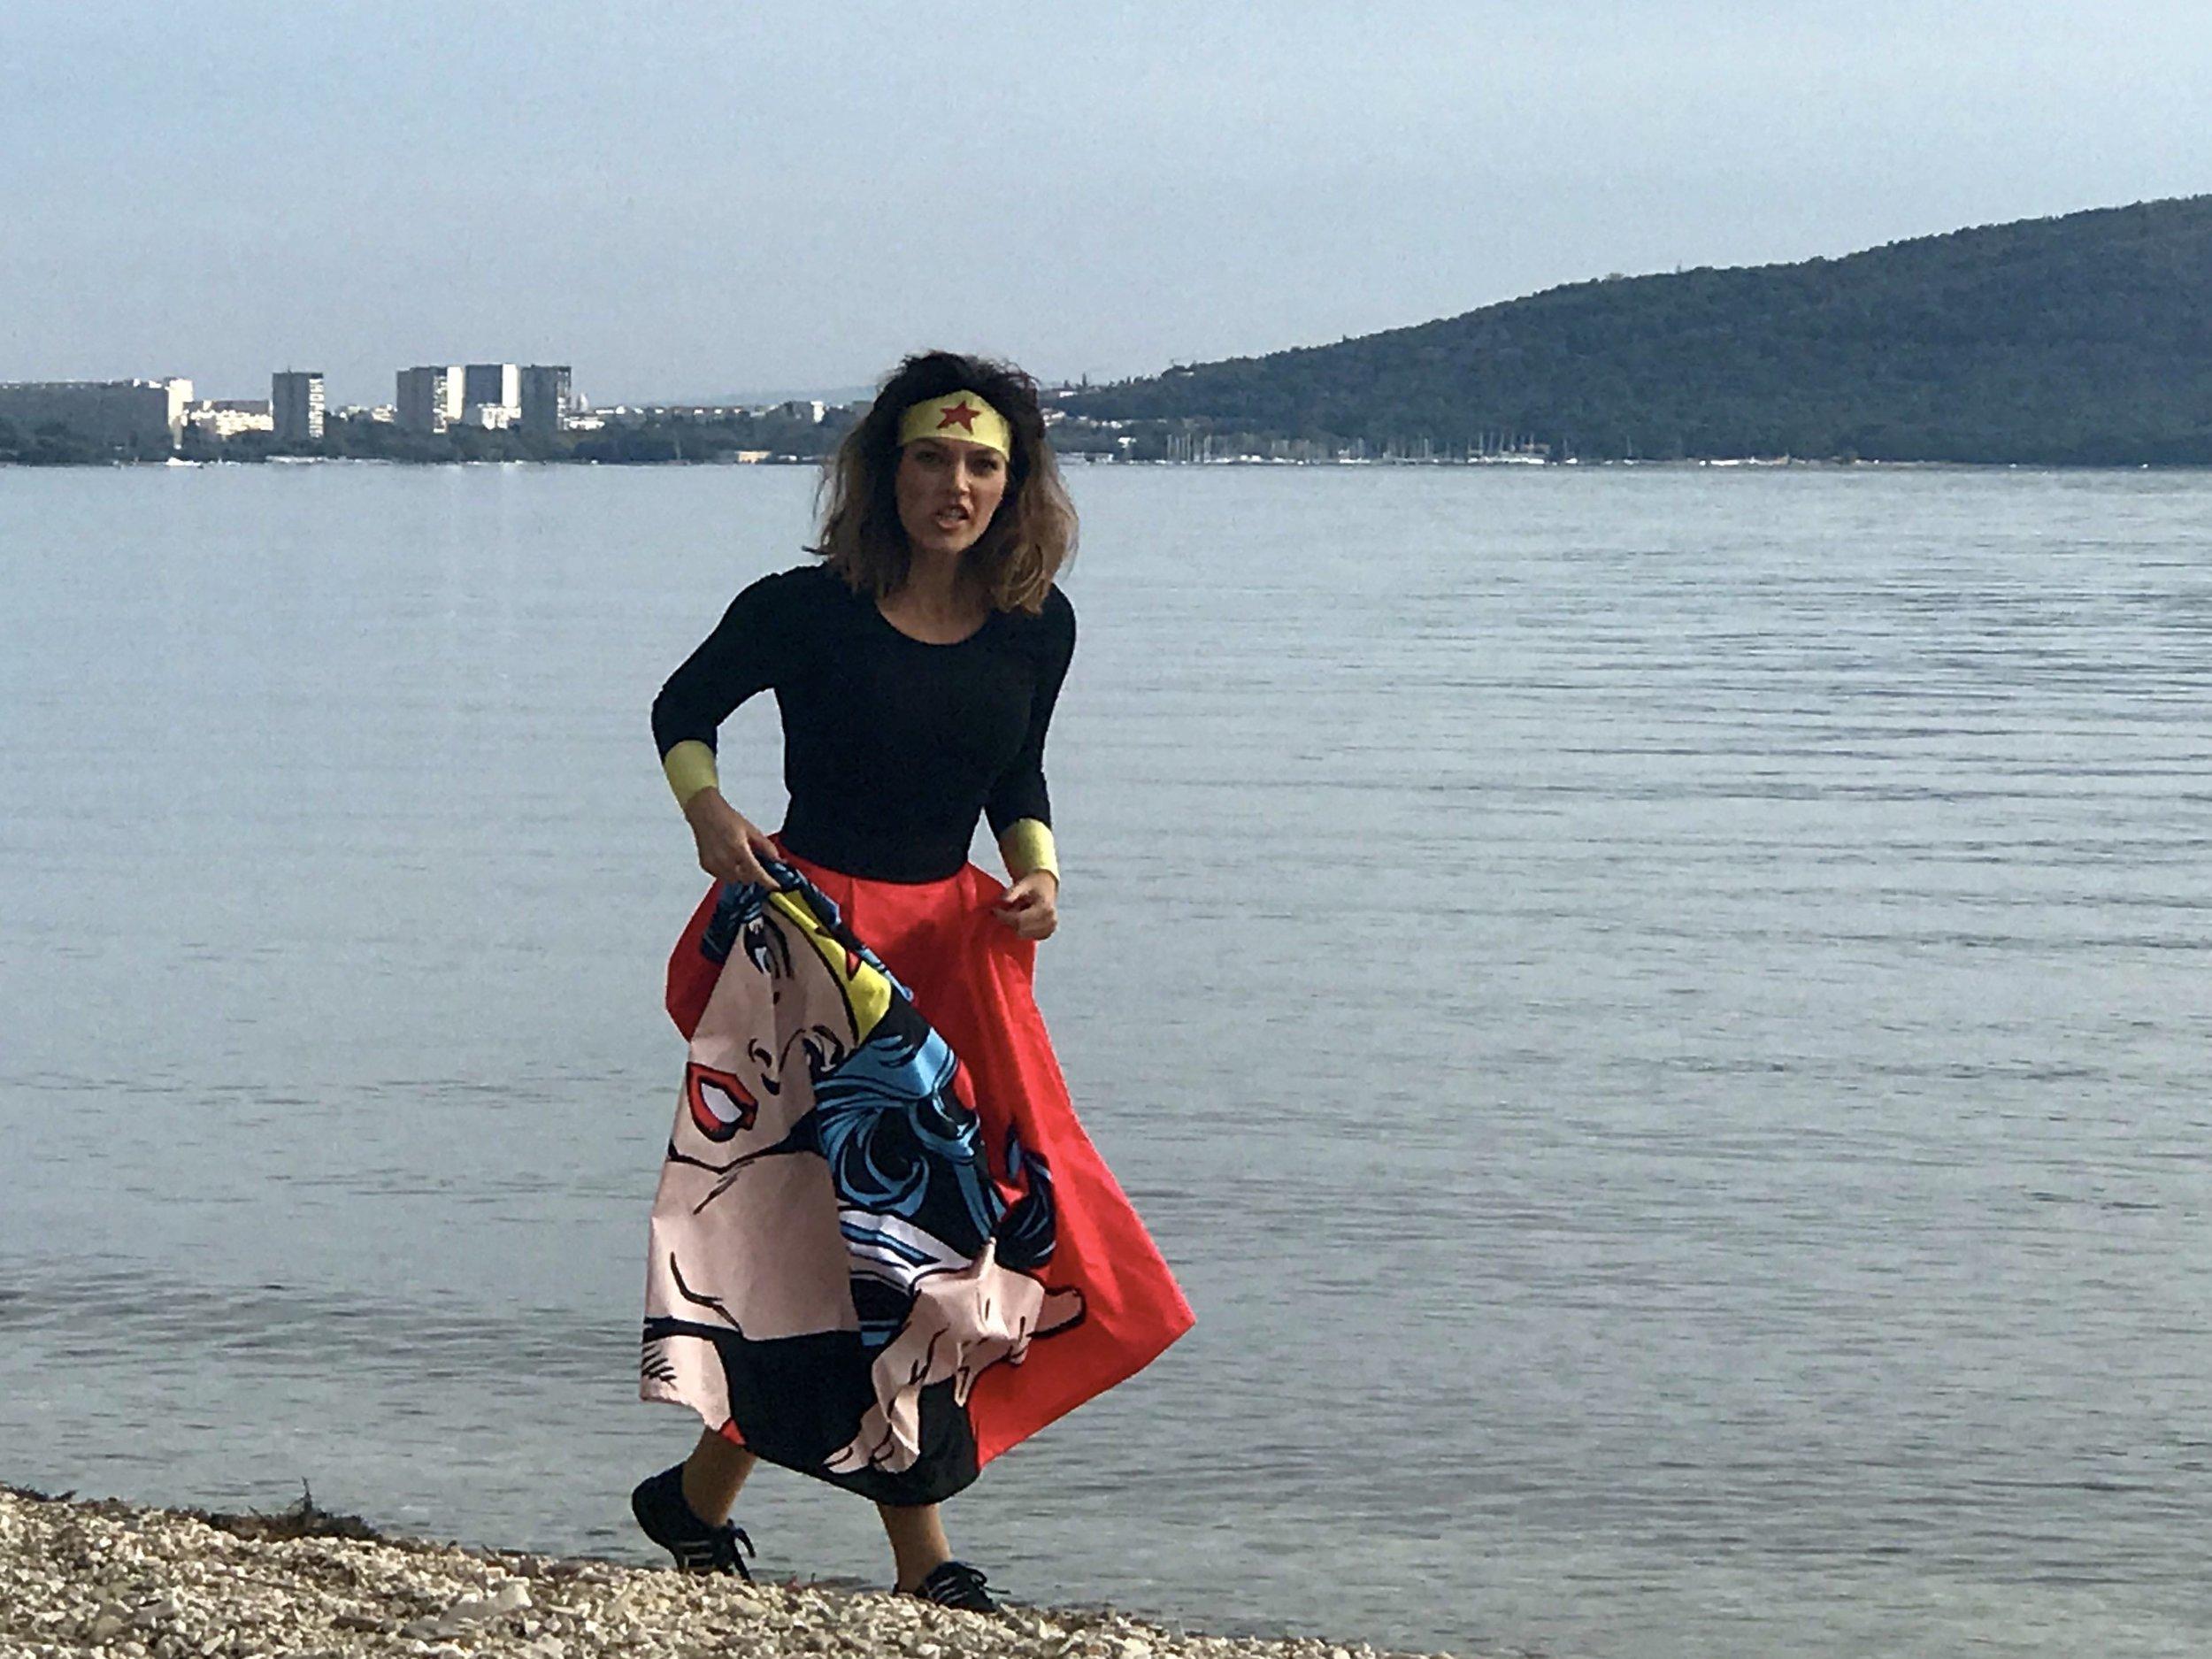 Wonder Woman saving the world